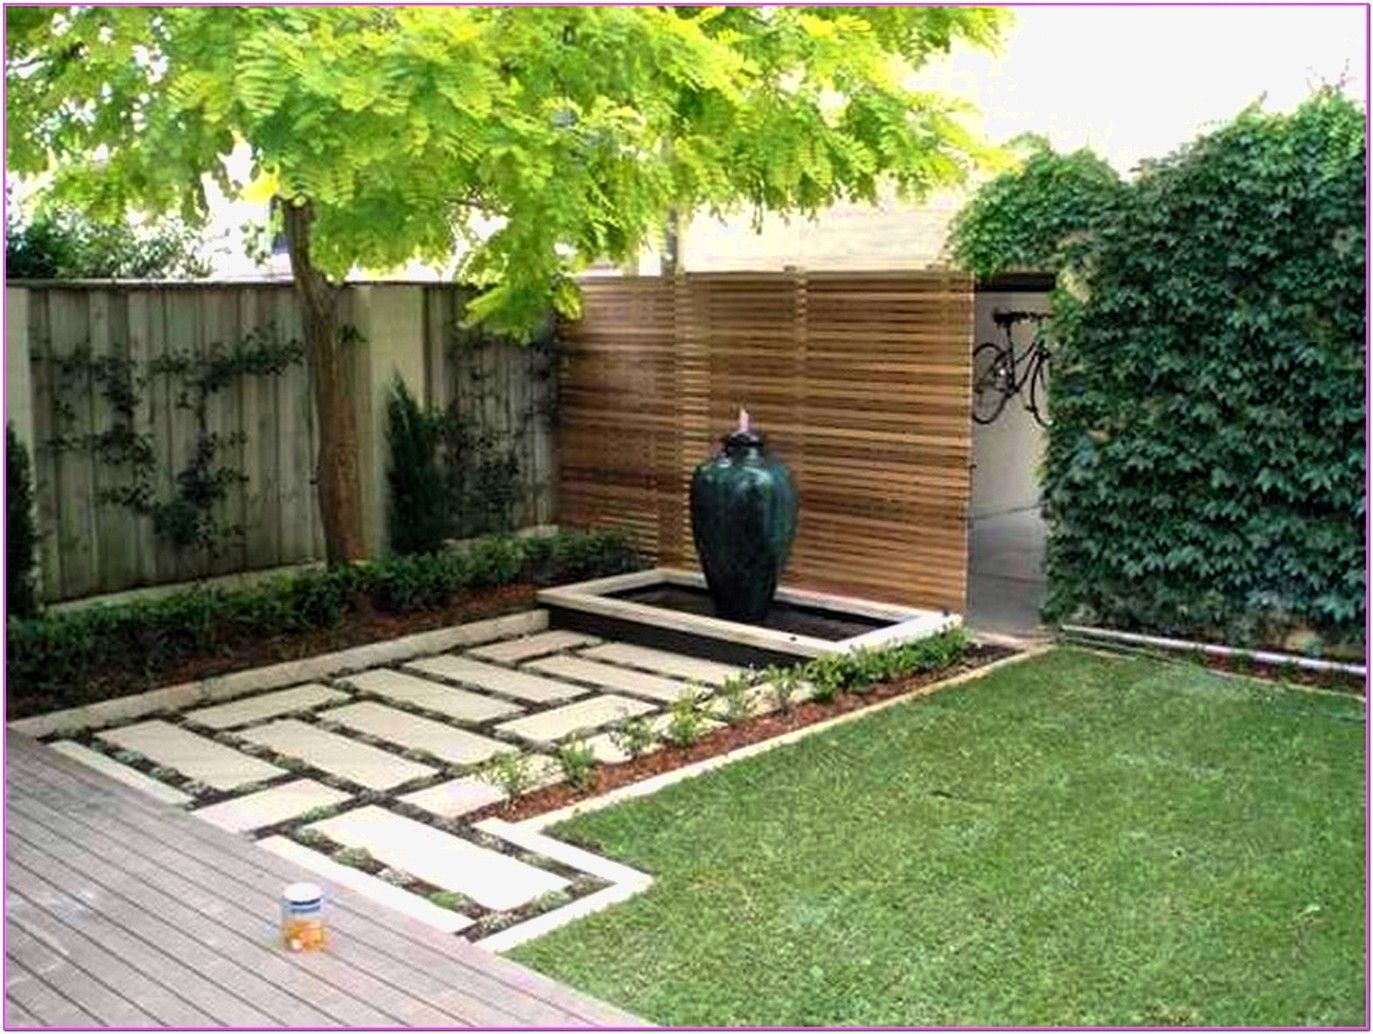 Backyard Design Ideas On A Budget Backyard Landscaping On A Budget